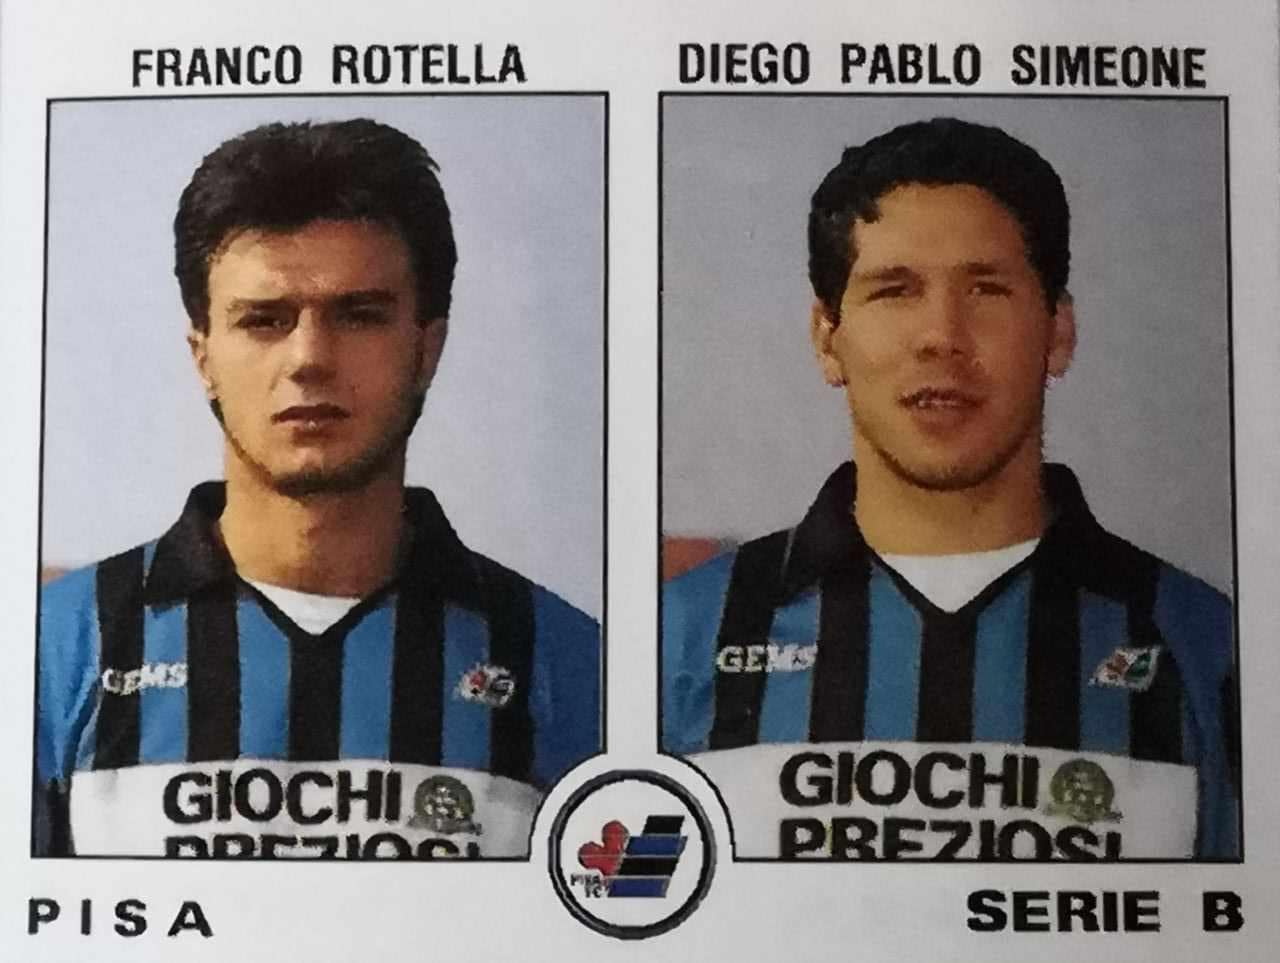 Serie B Simeone Pisa